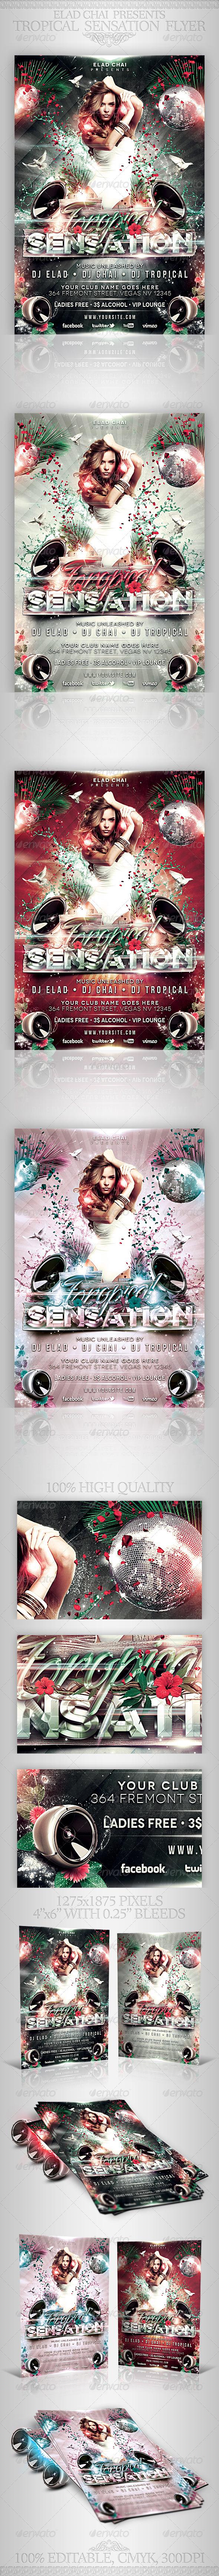 GraphicRiver Tropical Sensation Party Flyer Template 2629649